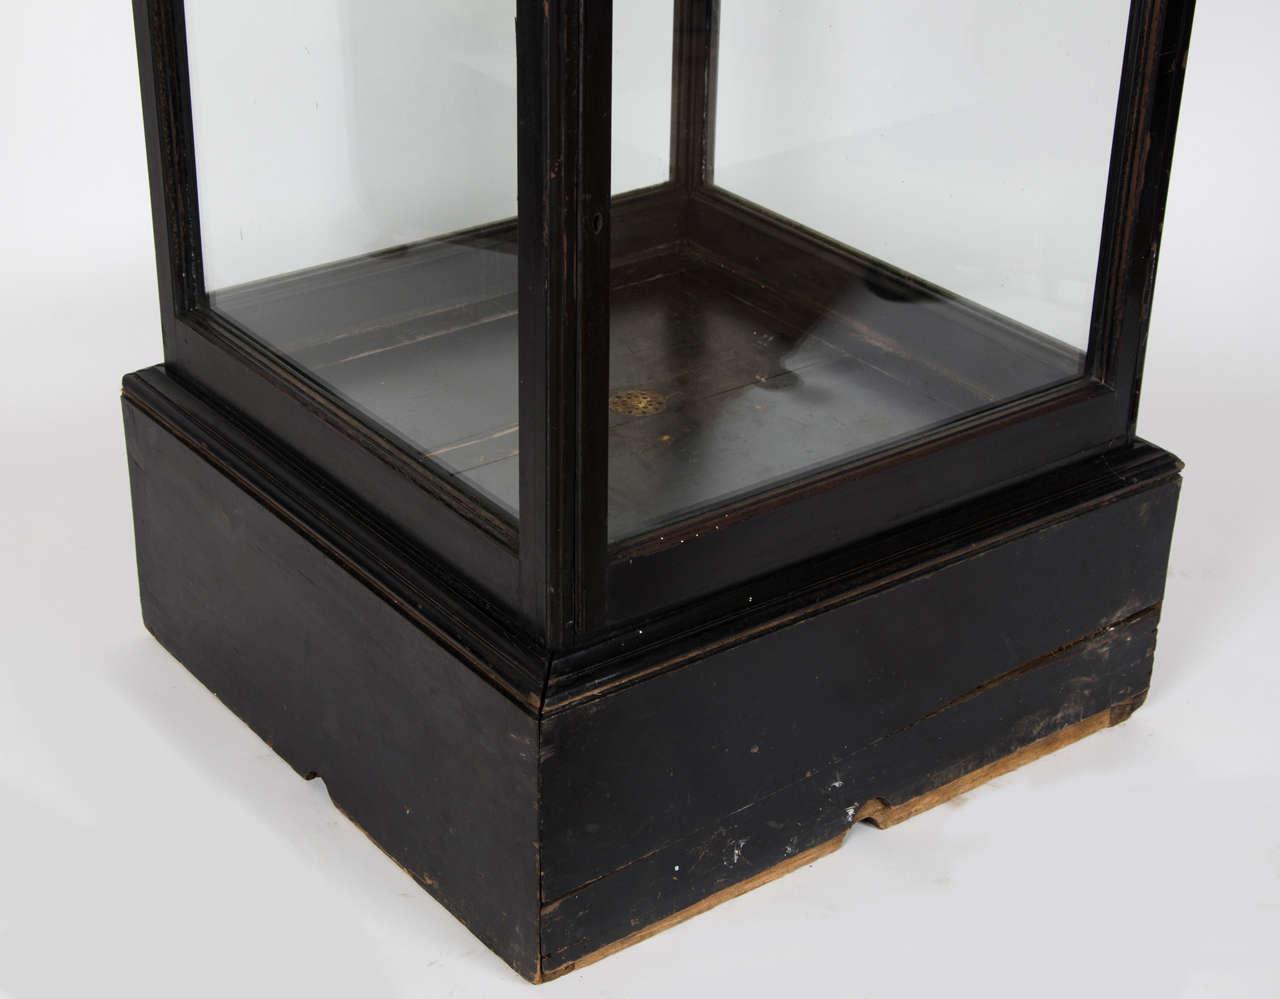 antique mahogany vitrine display cabinet at 1stdibs. Black Bedroom Furniture Sets. Home Design Ideas